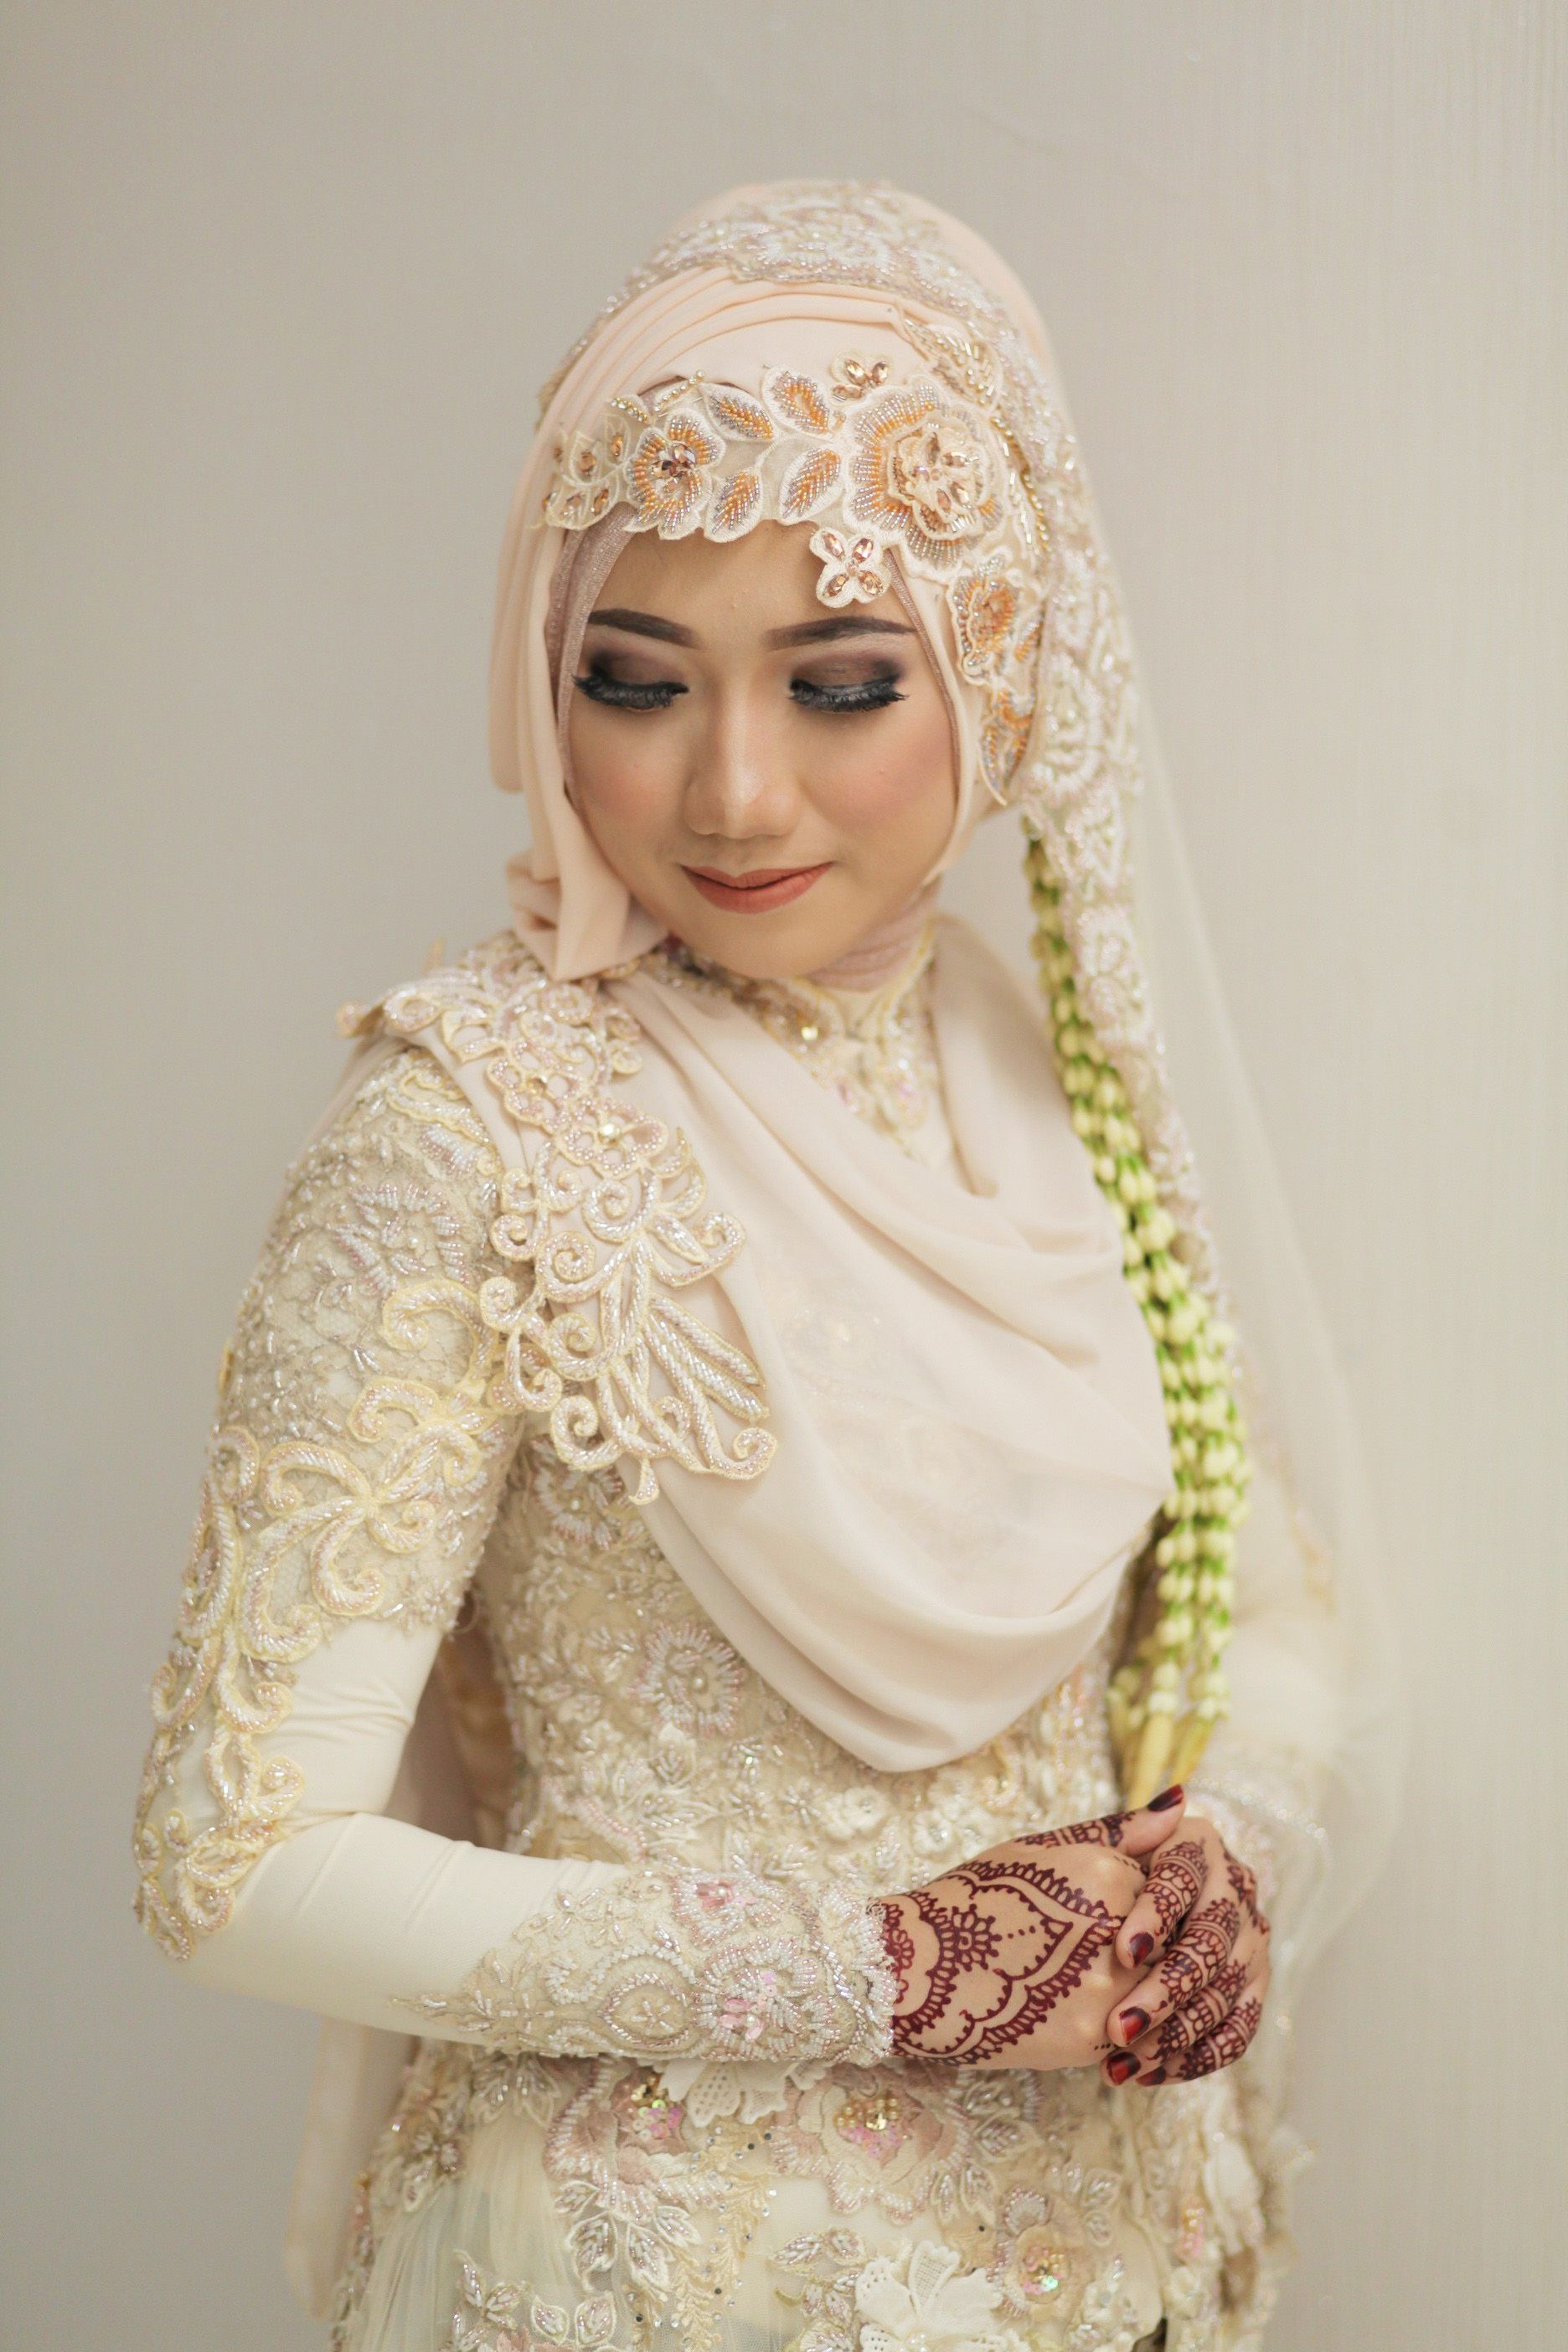 Ide Model Baju Pengiring Pengantin Muslim 87dx Awalia Nofitasari Awalianofitasar On Pinterest